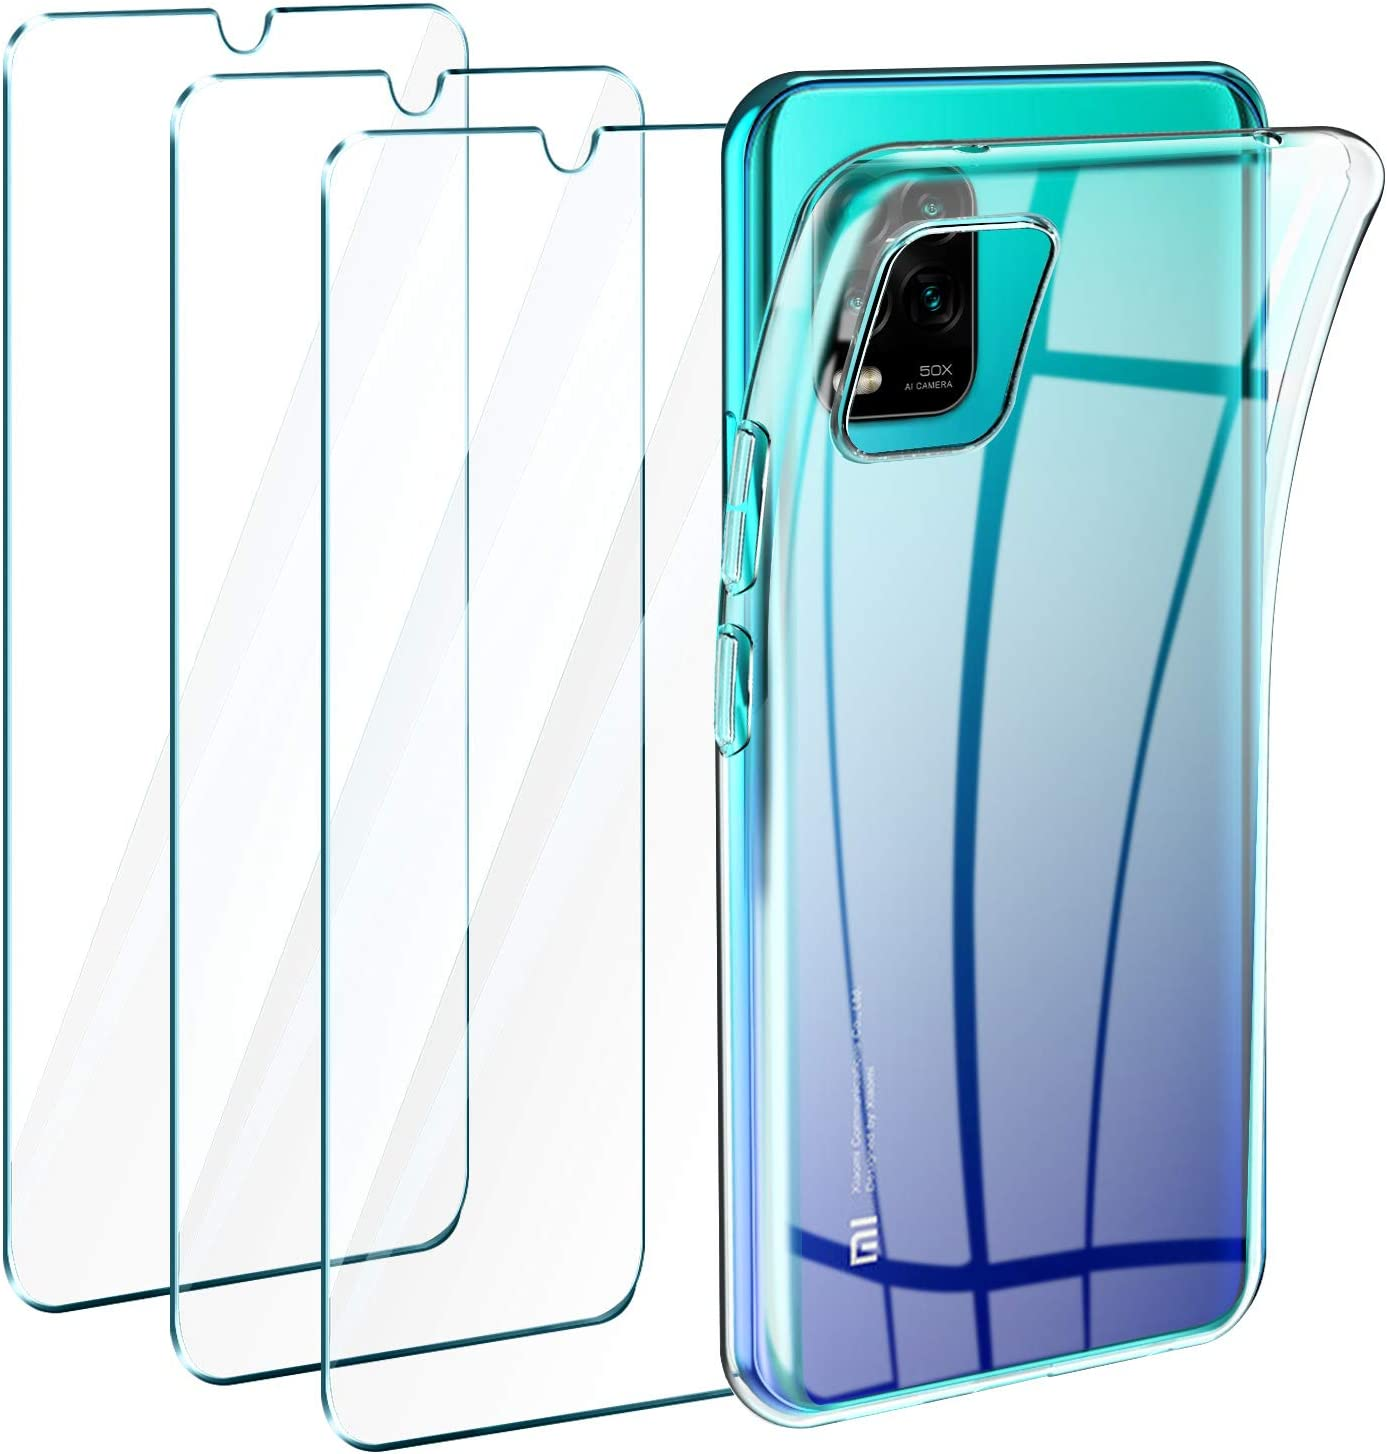 Leathlux Funda Xiaomi Mi 10 Lite 5G + 3 x Protector de Pantalla Xiaomi Mi 10 Lite 5G, Transparente TPU Silicona Funda + Cristal Vidrio Templado Protector de Pantalla y Carcasa Xiaomi Mi 10 Lite 6.57